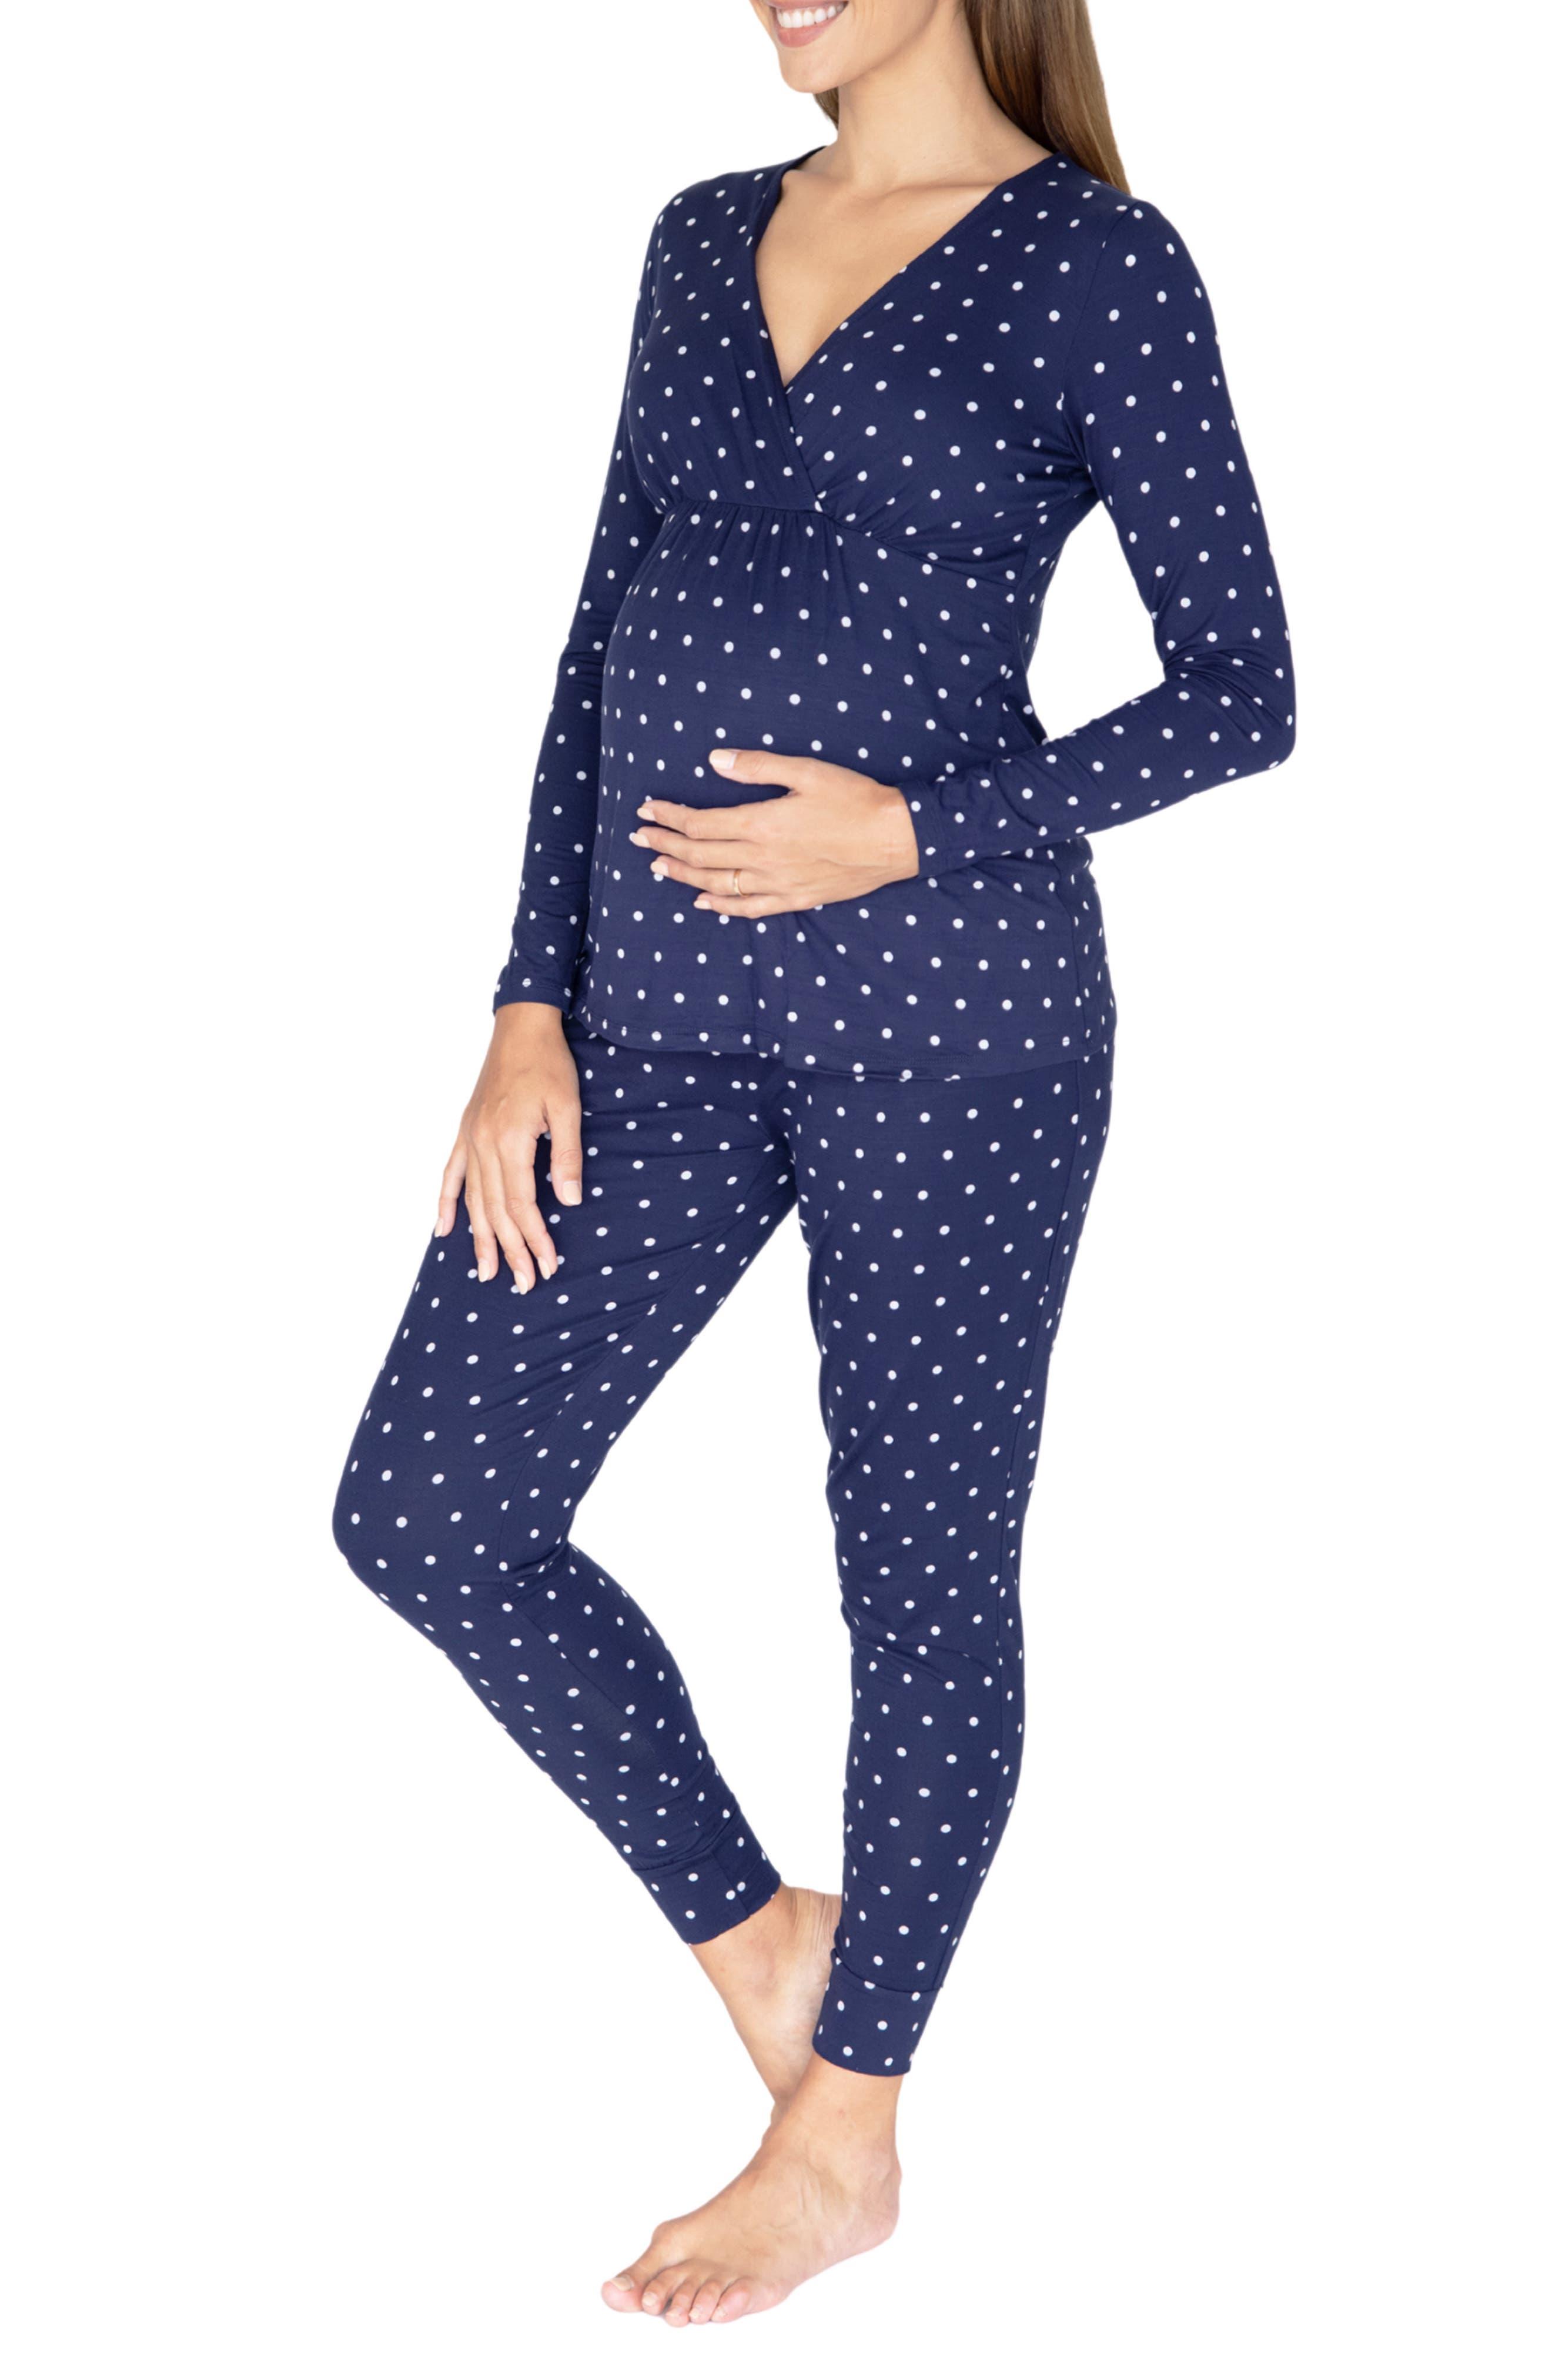 Polka Dot Maternity/nursing Pajamas